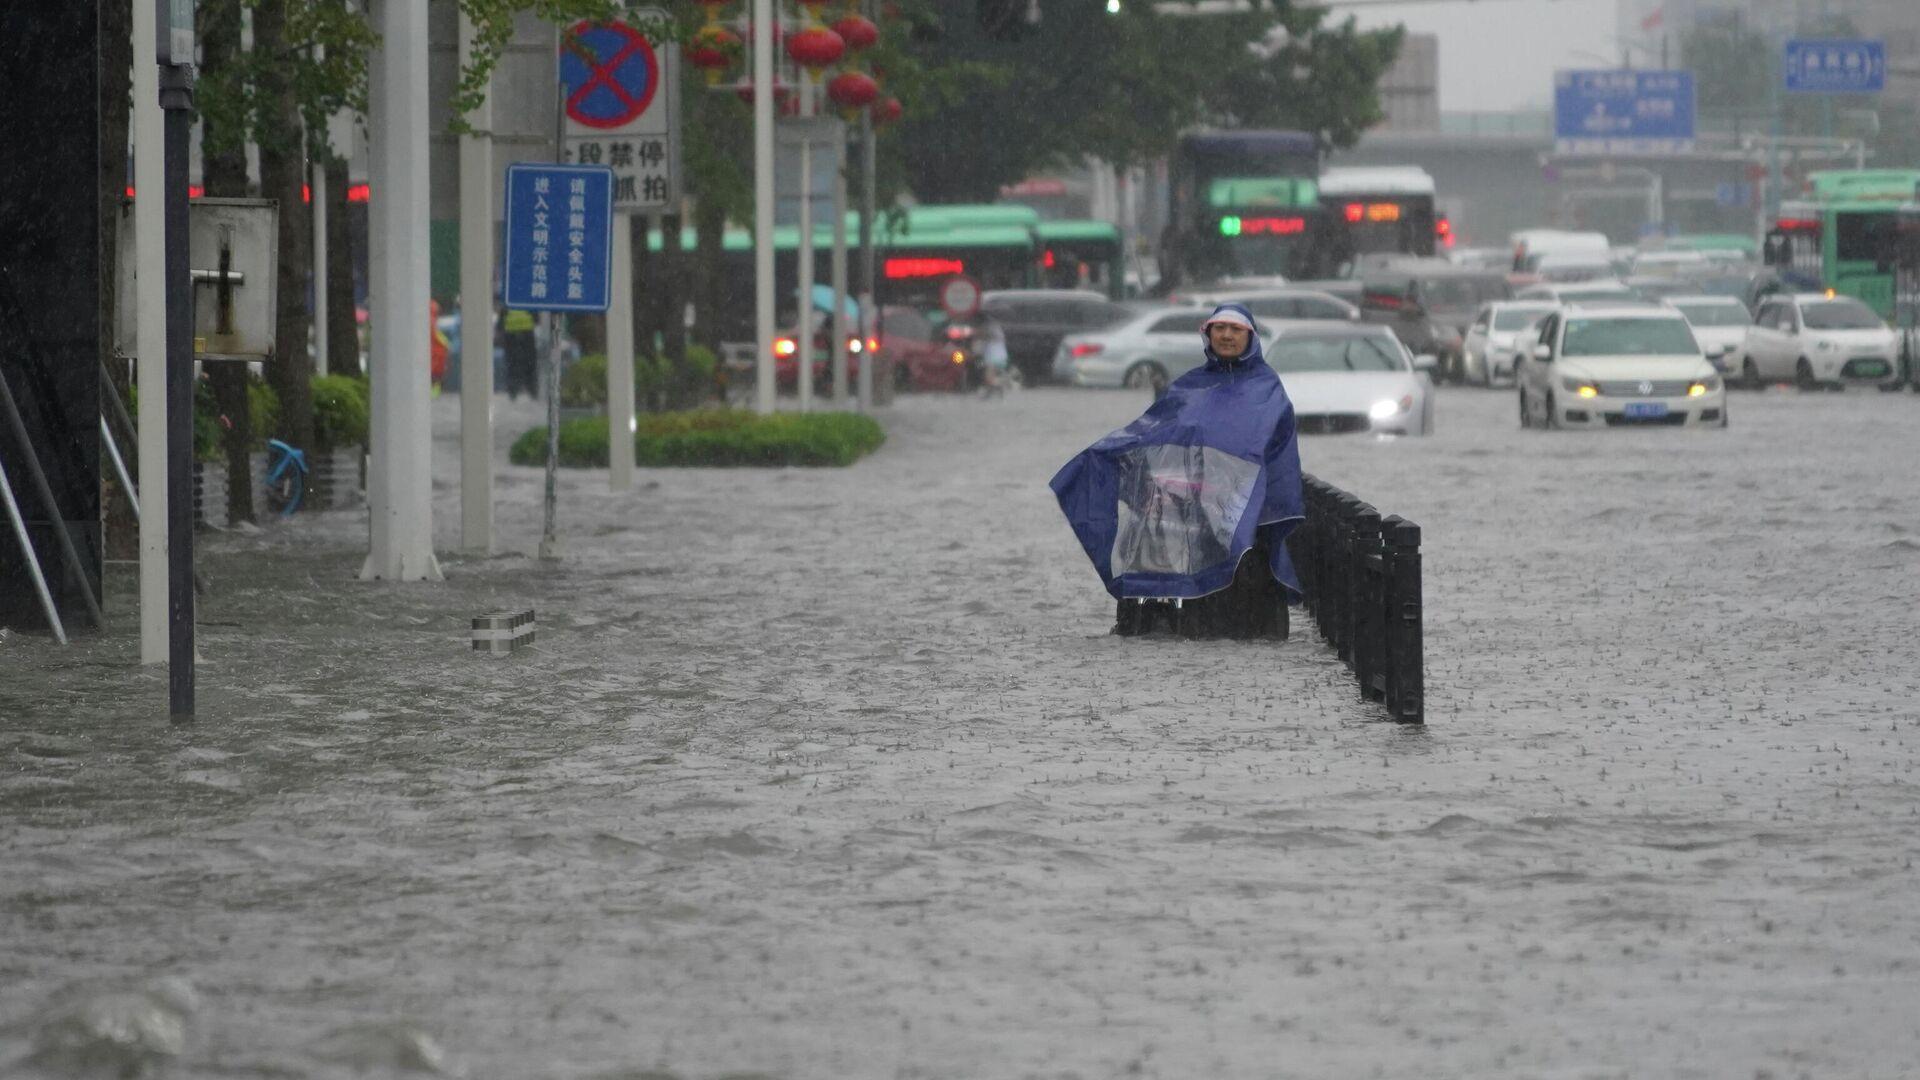 Inundaciones en Zhengzhou, China - Sputnik Mundo, 1920, 20.07.2021